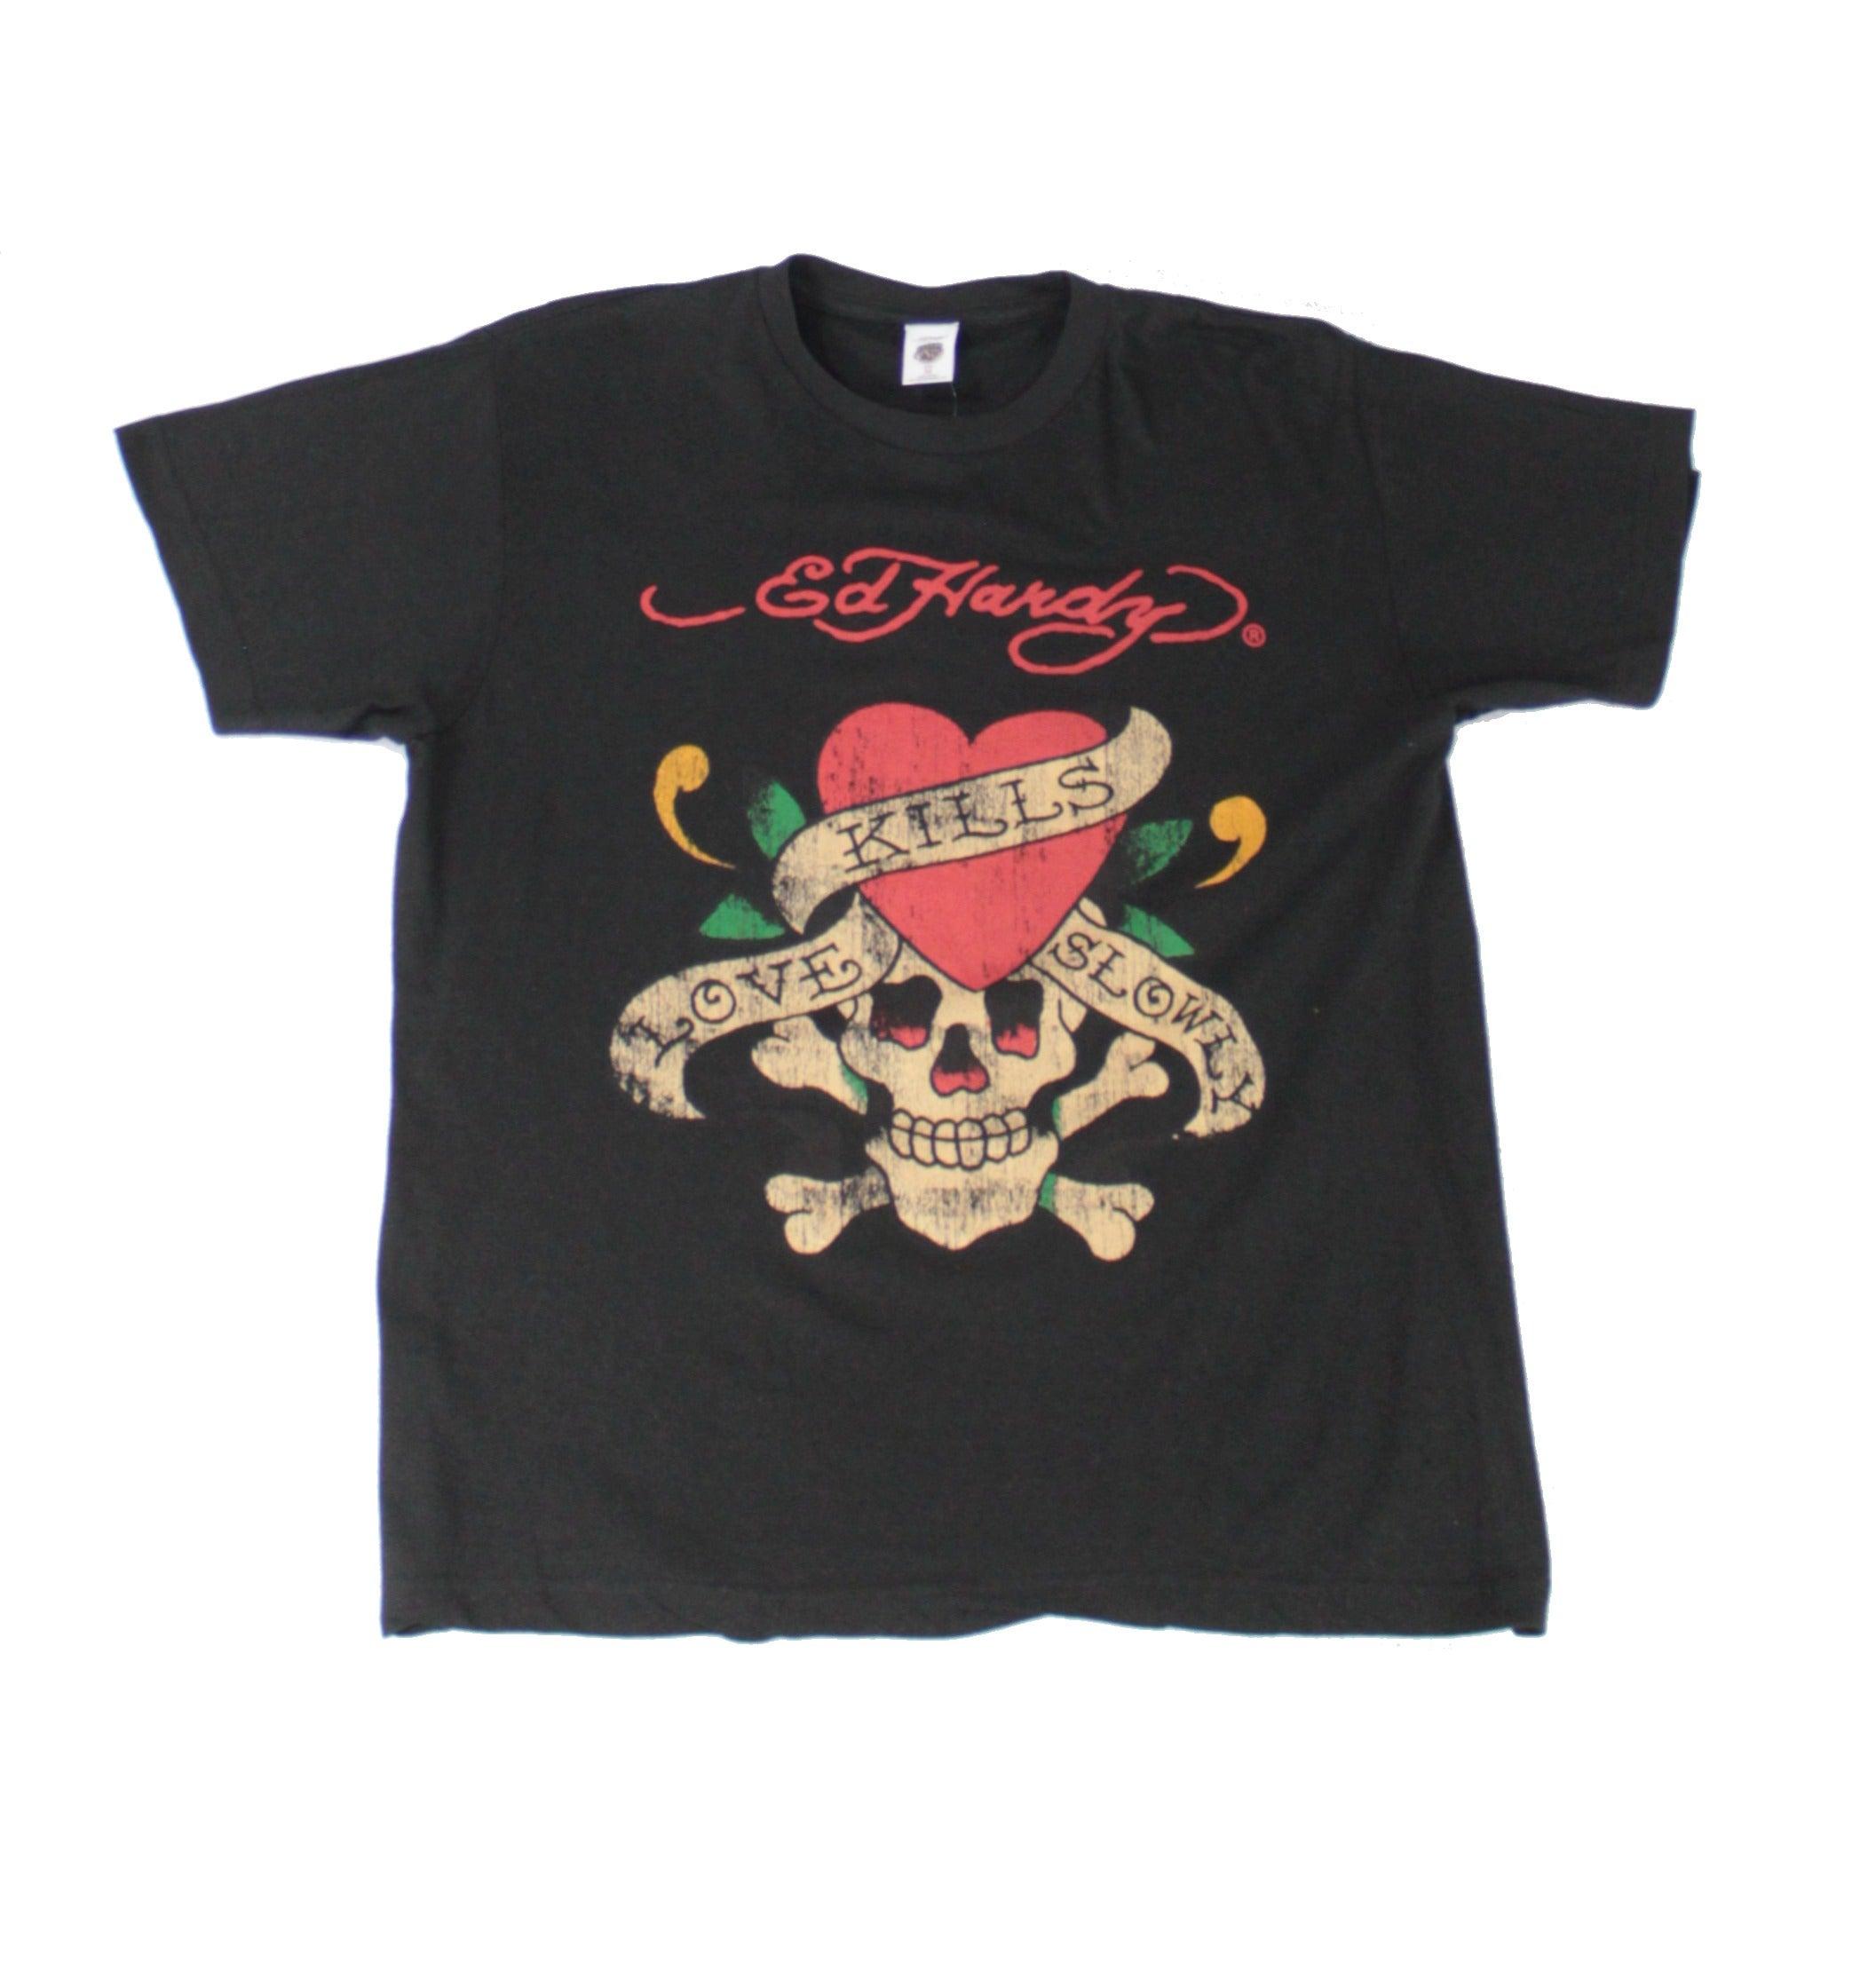 Ed Hardy Mens T-Shirt Black Size Large L Crew Neck Love Kills Slowly